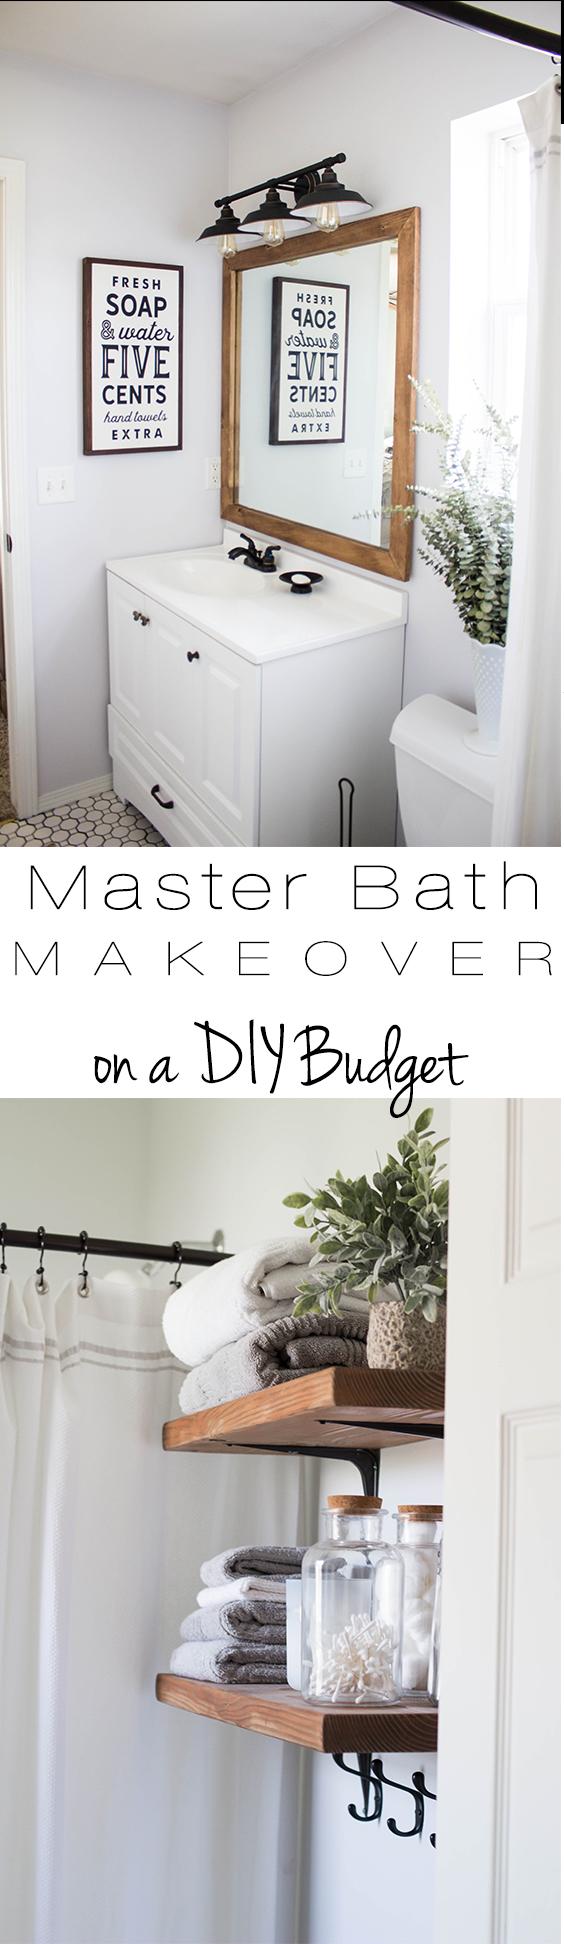 Master Bath Makeover on a DIY Budget